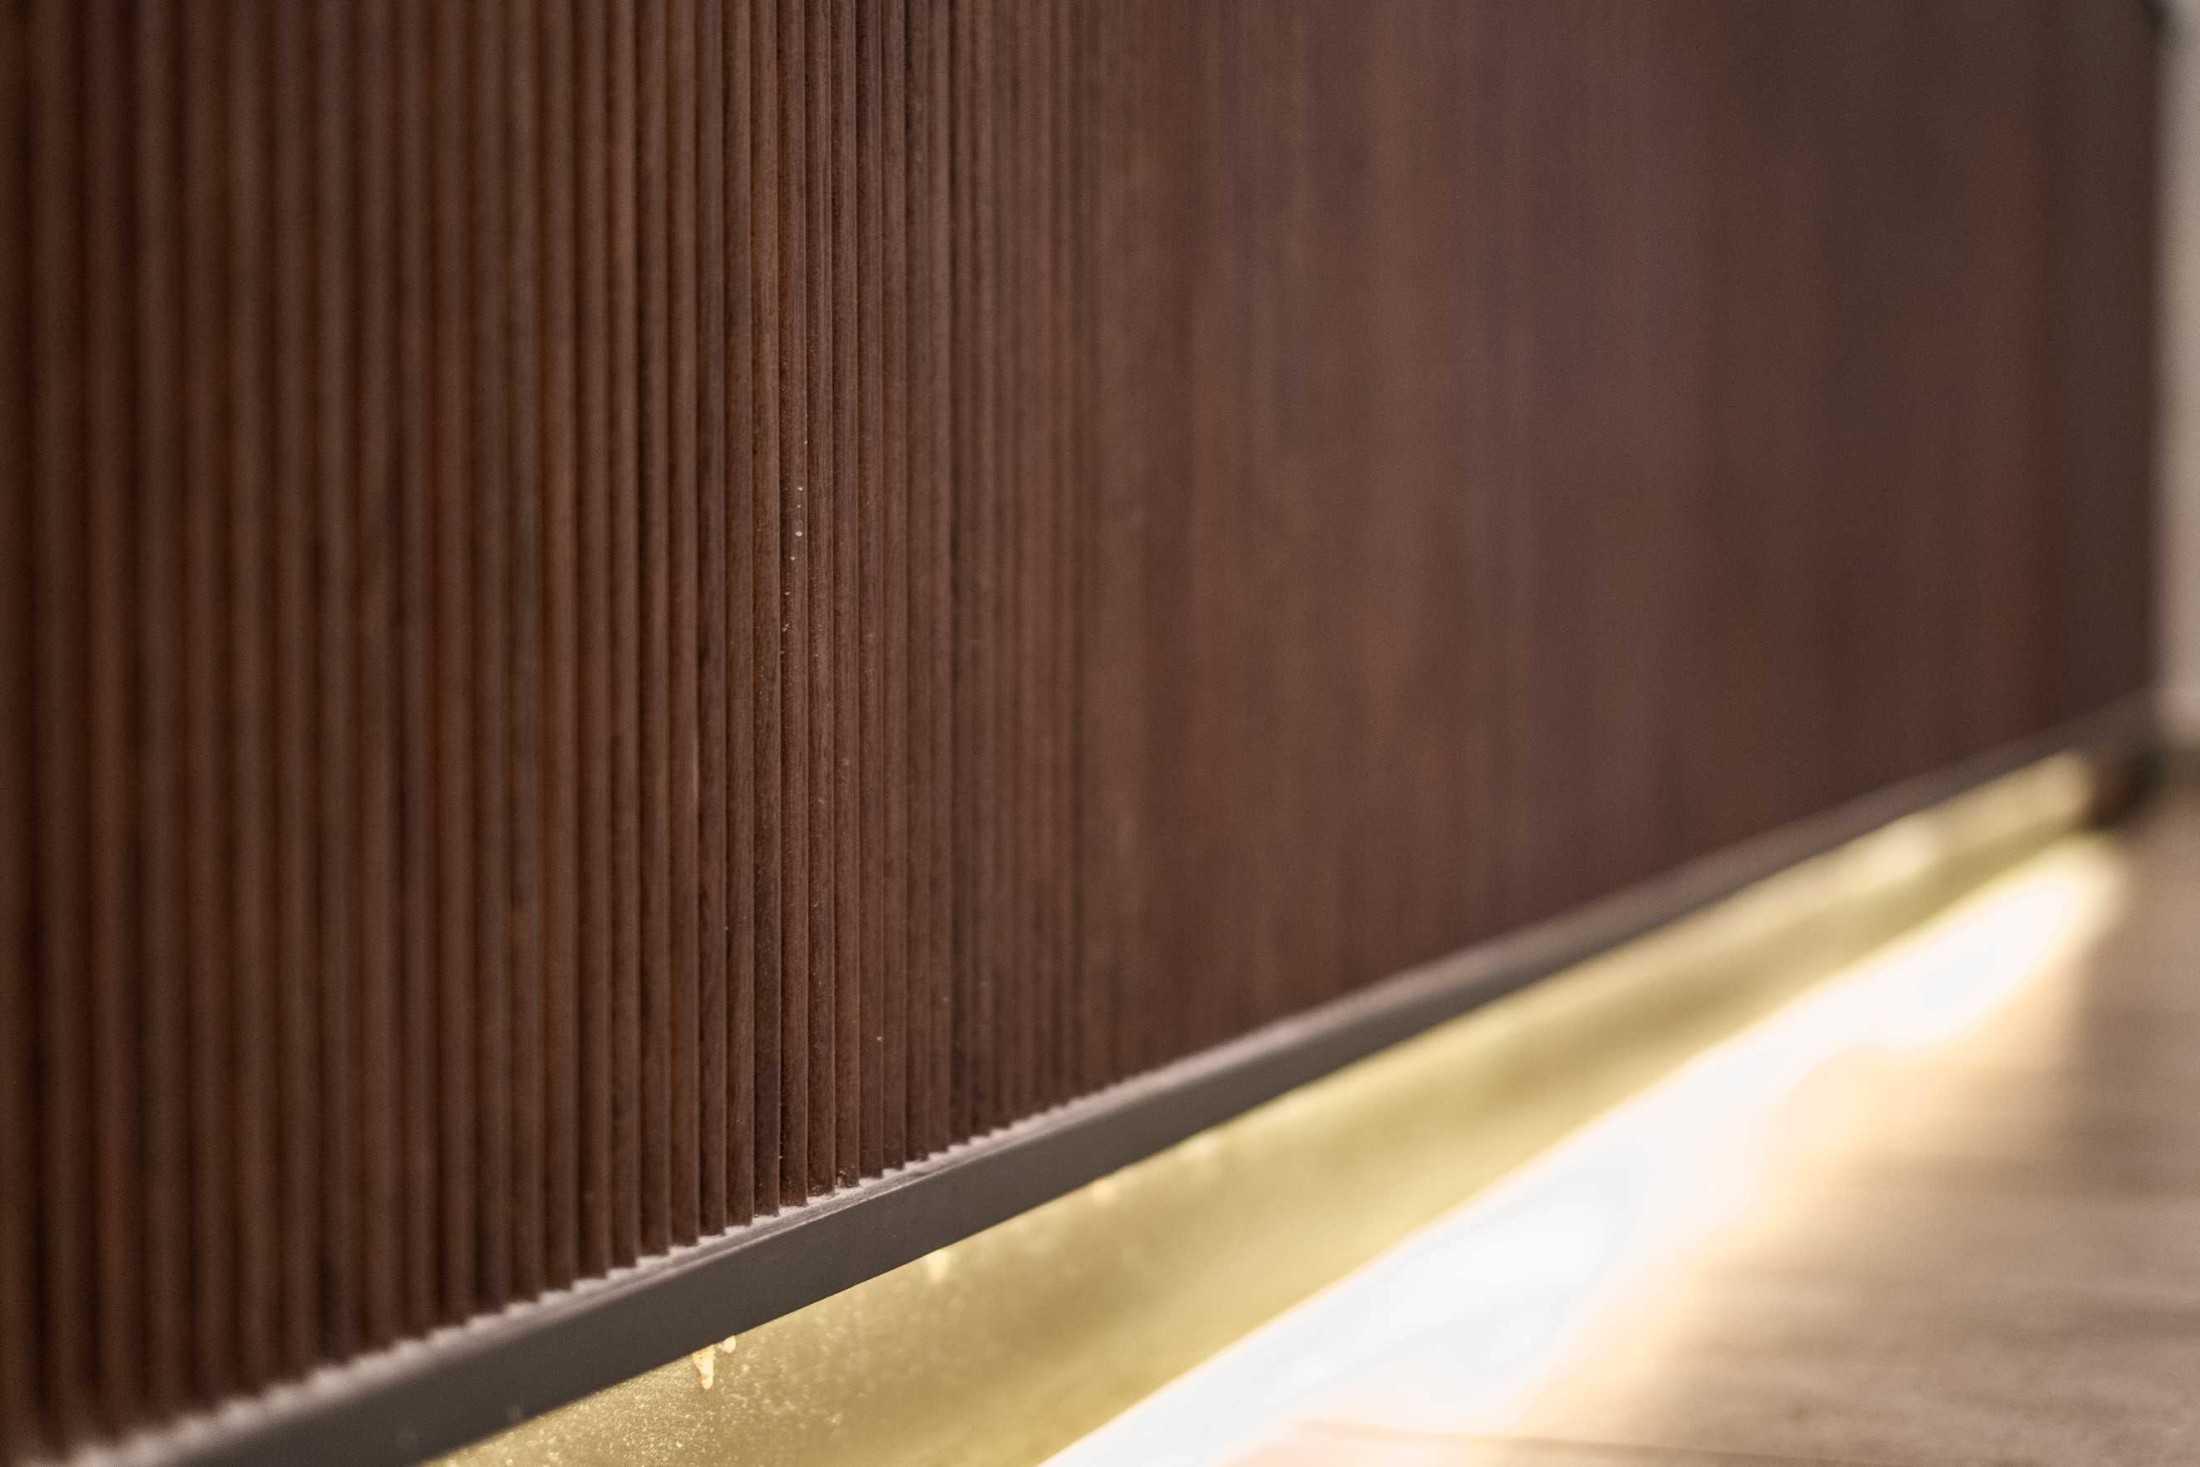 Makai Design Company Kopi Kenangan - Giant Bintaro Pondok Pucung, Jalan Bintaro Utama 9 No.53, Pondok Jaya, Pondok Aren, Pd. Jaya, Kec. Pd. Aren, Kota Tangerang Selatan, Banten 15229, Indonesia Pondok Pucung, Jalan Bintaro Utama 9 No.53, Pondok Jaya, Pondok Aren, Pd. Jaya, Kec. Pd. Aren, Kota Tangerang Selatan, Banten 15229, Indonesia Makai-Design-Company-Kopi-Kenangan  72993